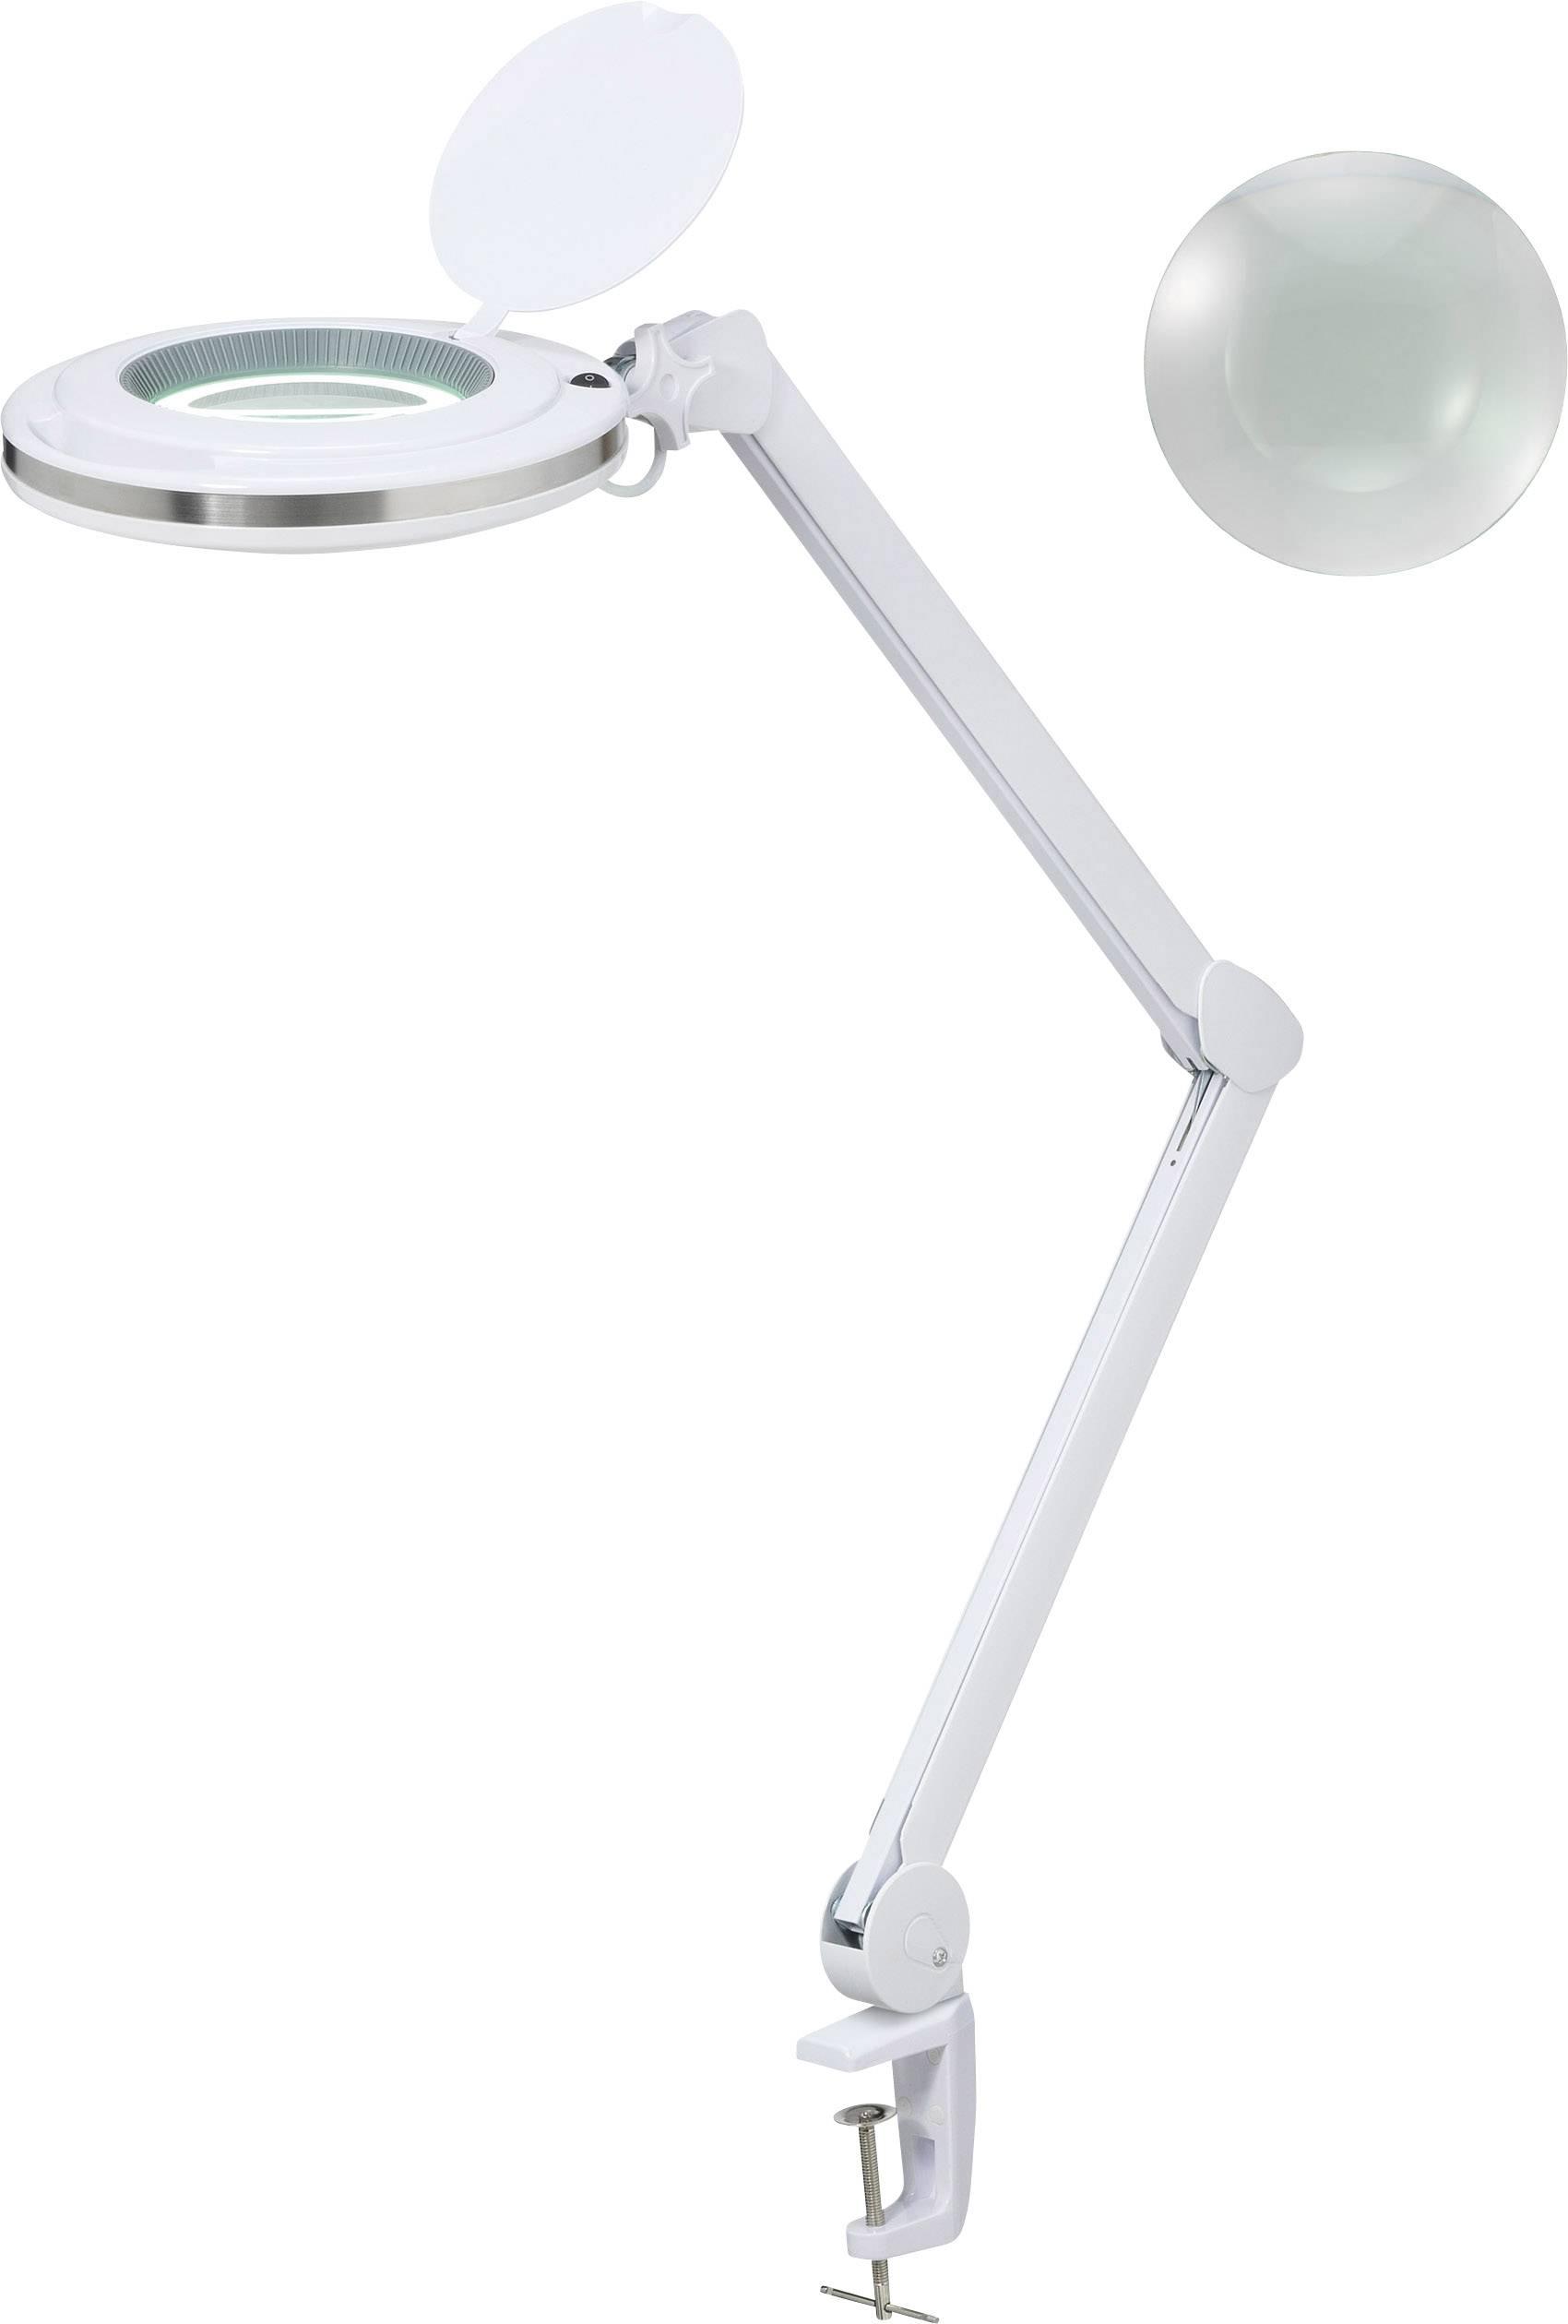 Toolcraft 2148845 Led Magnetic Light 5 With Clip Mount 8d 3x 127 Cm Conrad Com